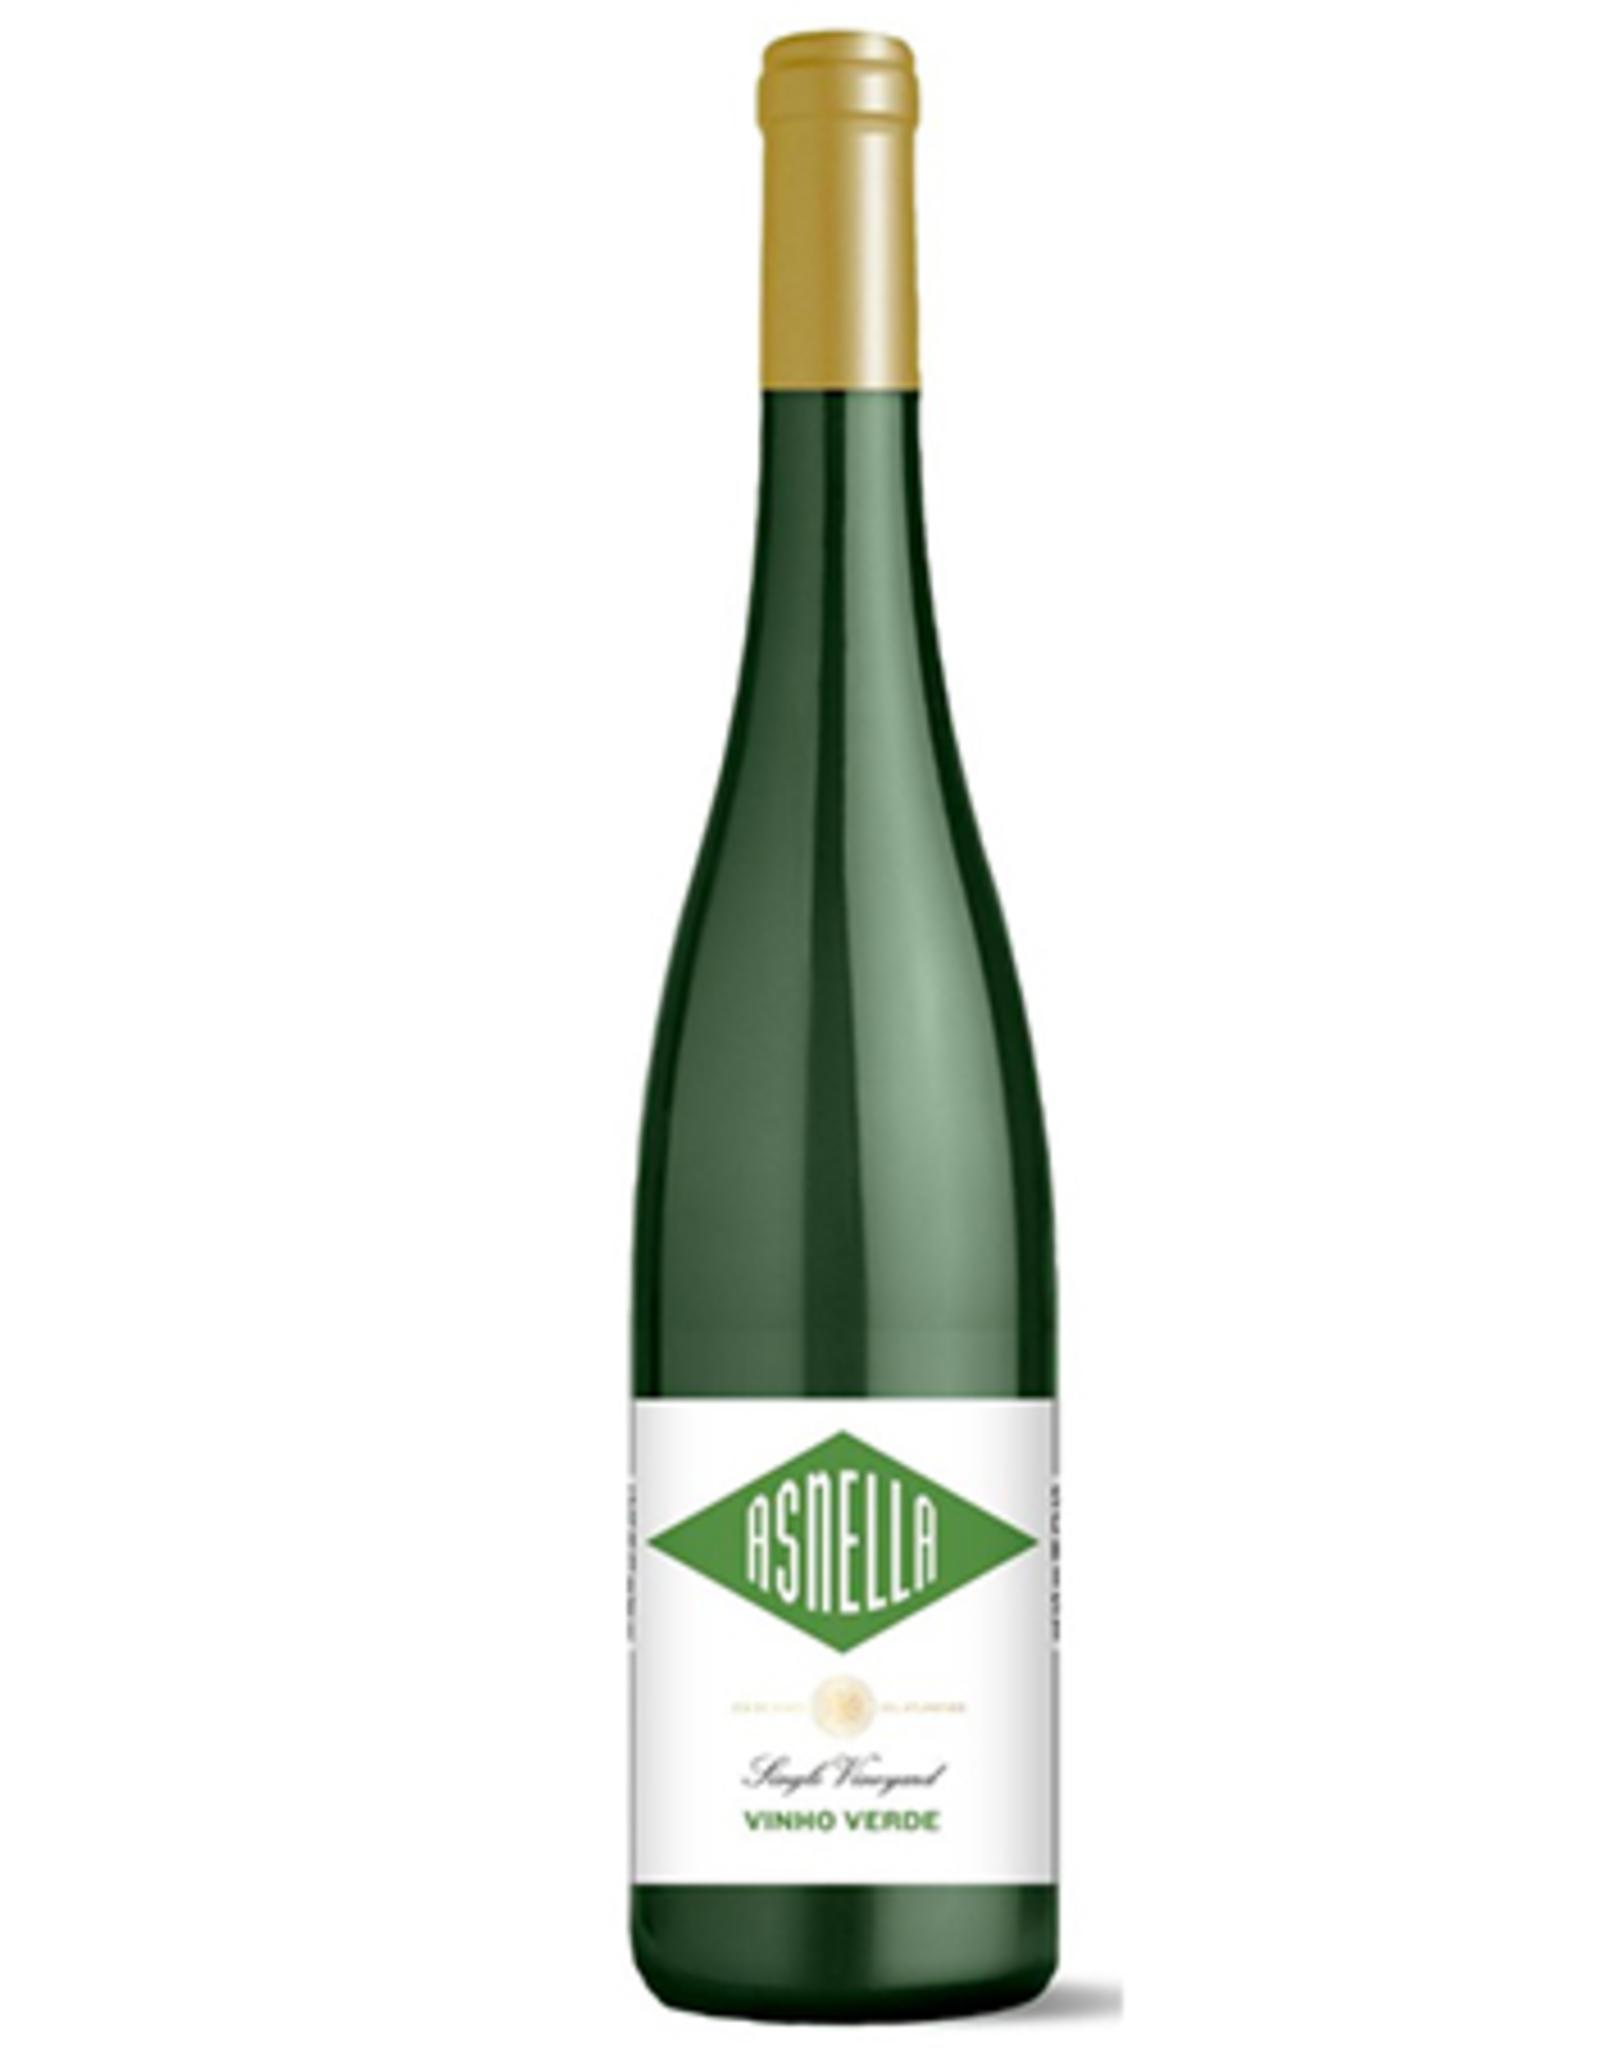 Asnella Asnella Vinho Verde Single Vineyard 2020